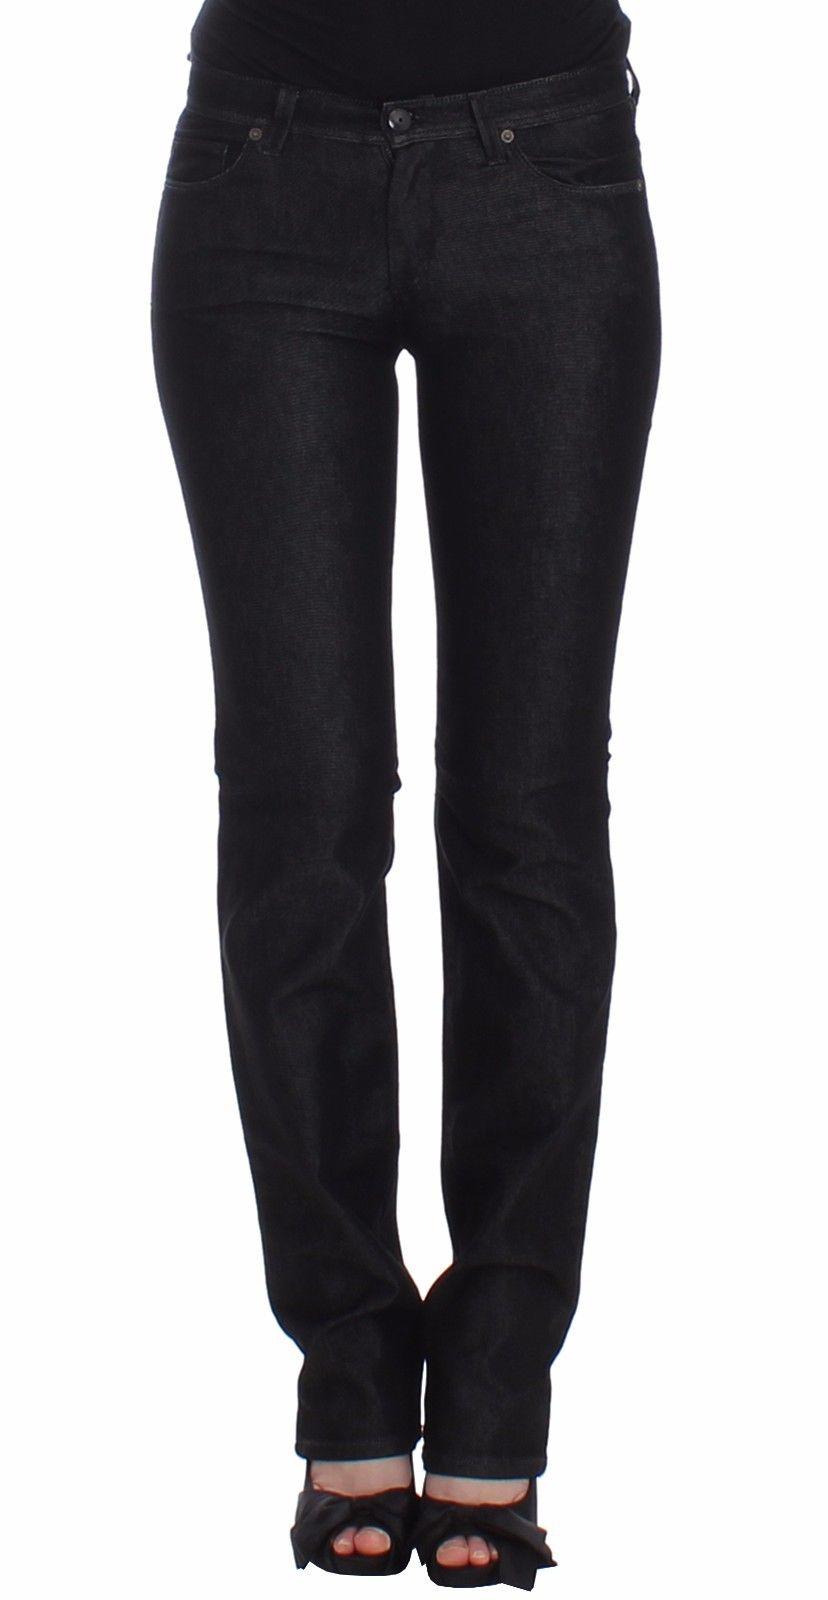 Ermanno Scervino Women's Slim Fit Jeans Black SIG12452 - W36